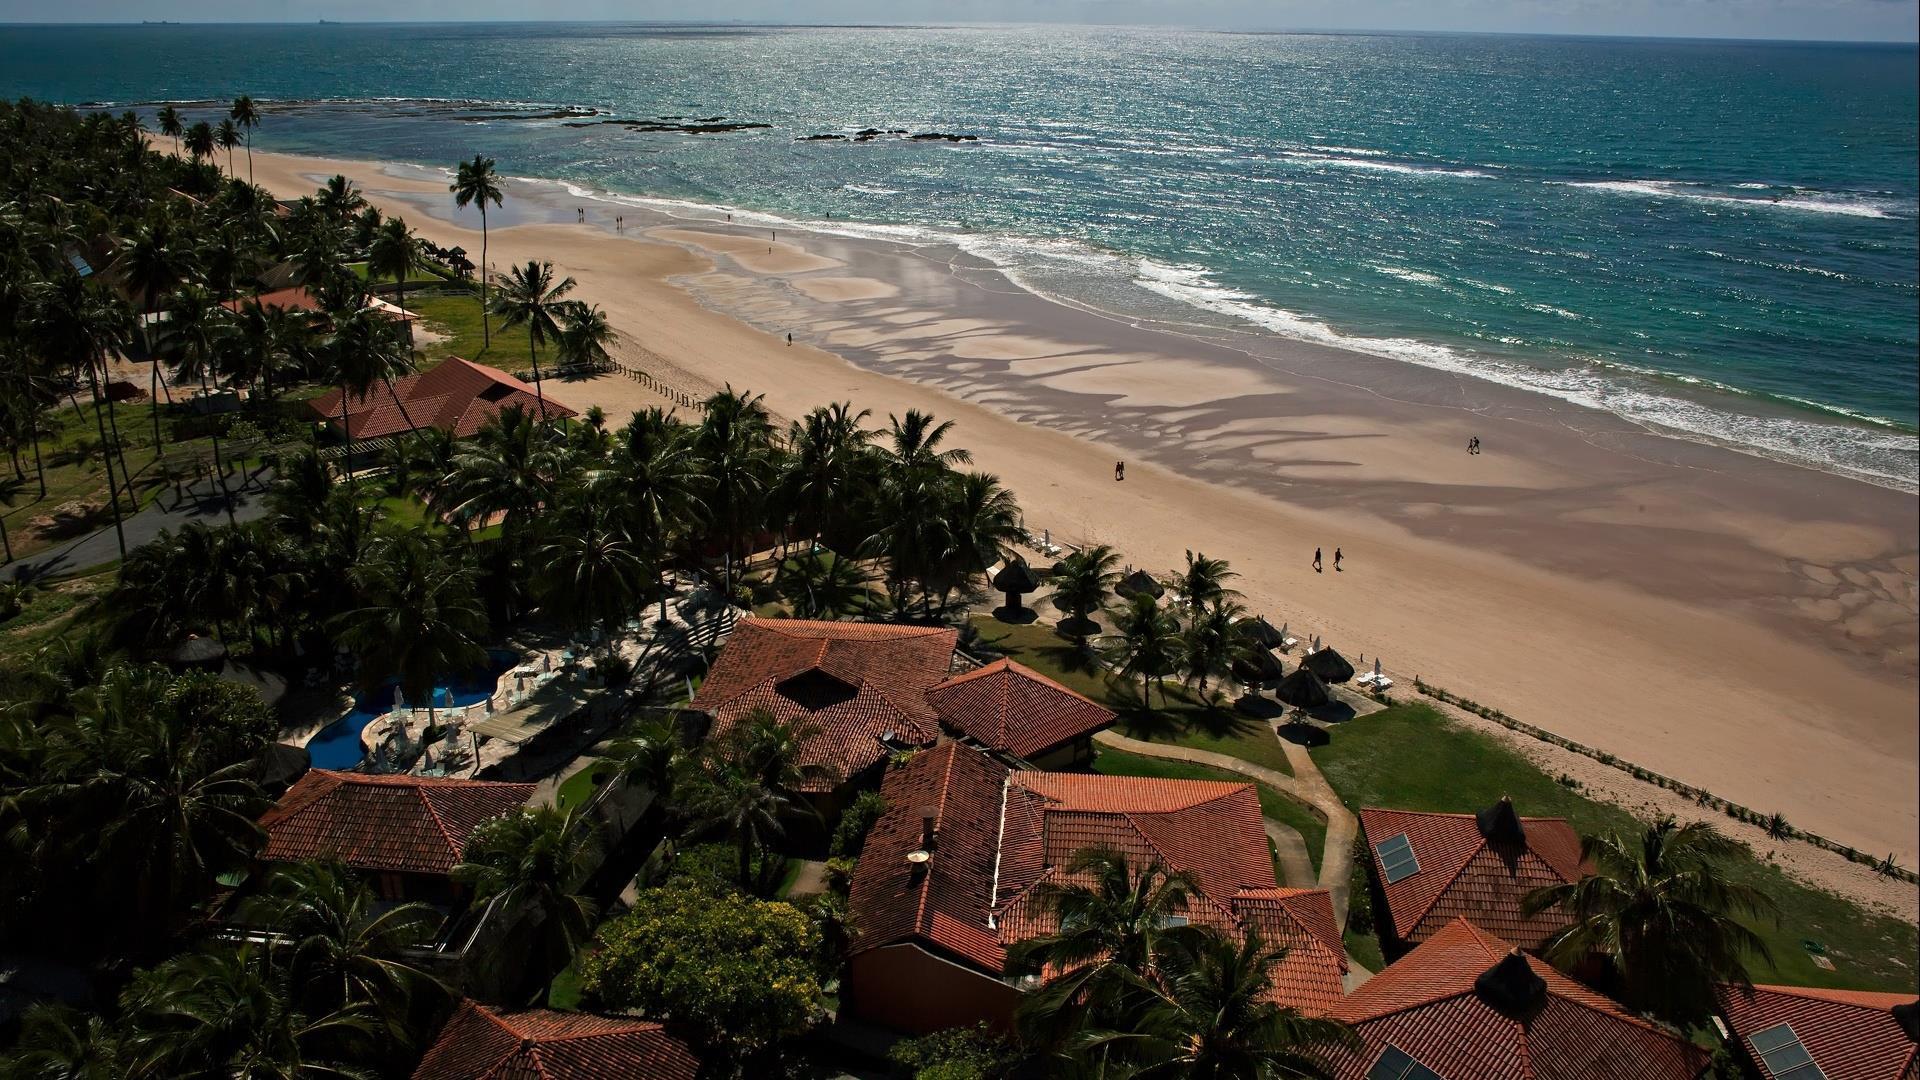 Brasilien Porto de Galinhas: Landestypische Unterkunft - Pousada Tabapitanga